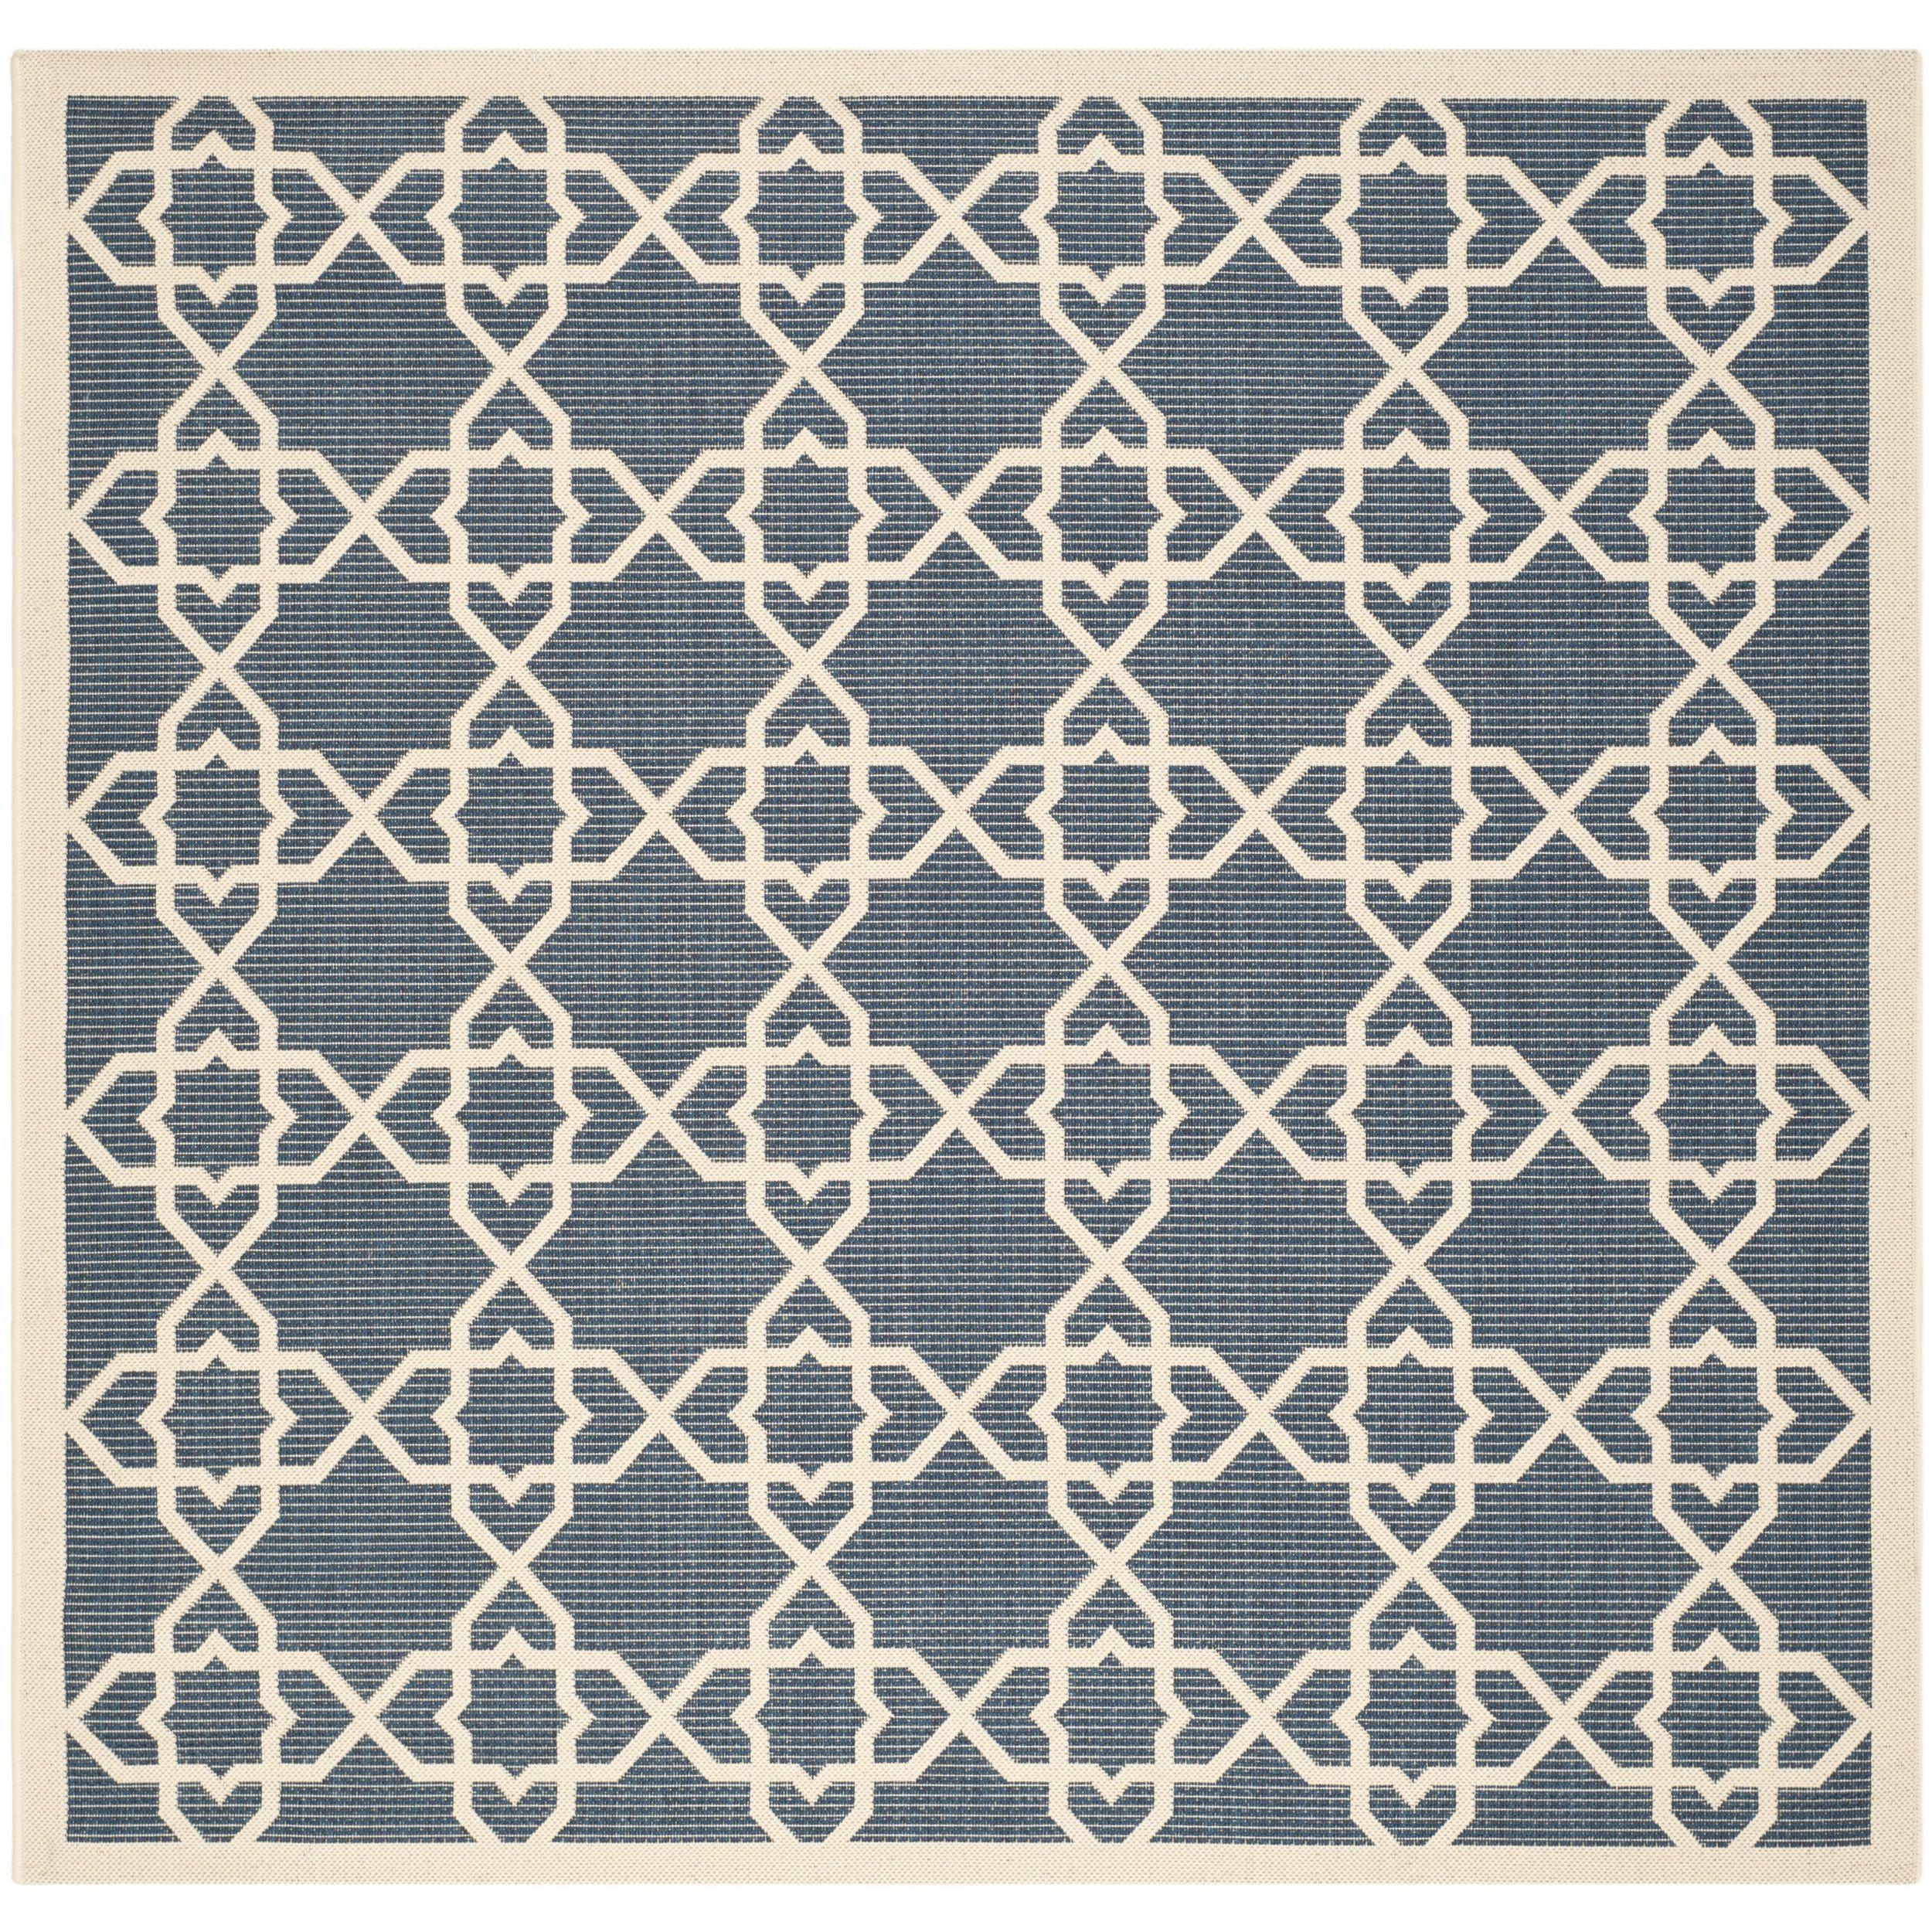 Safavieh Courtyard Geometric Trellis Navy Beige Indoor Outdoor Rug 6 7 Square Cy6032 268 7sq Blue Size X